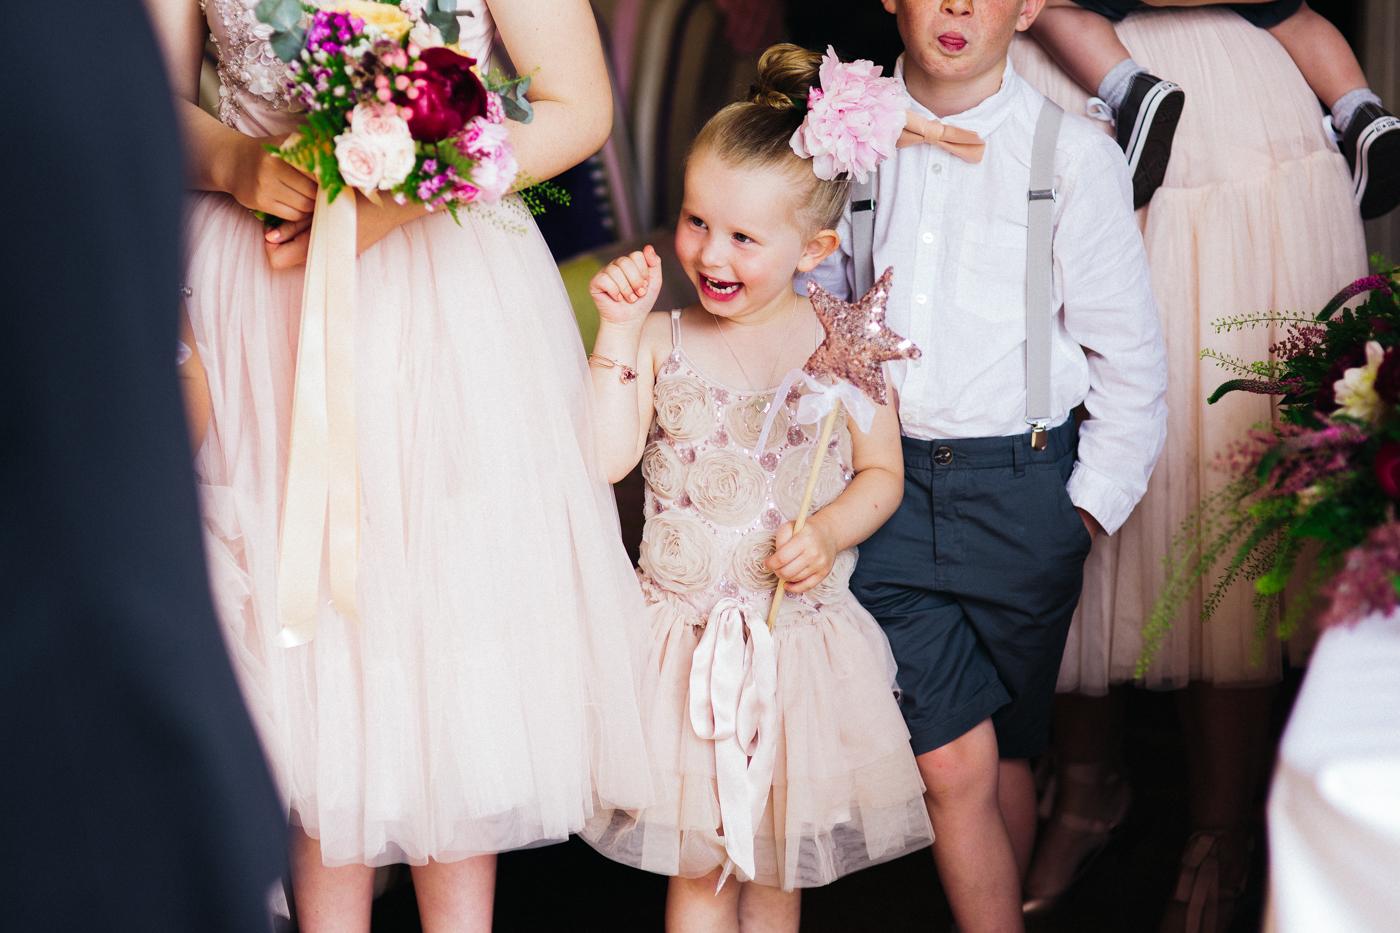 teesside-middlesbrough-north-east-wedding-photographer-creative-wedding-venues-0005.jpg